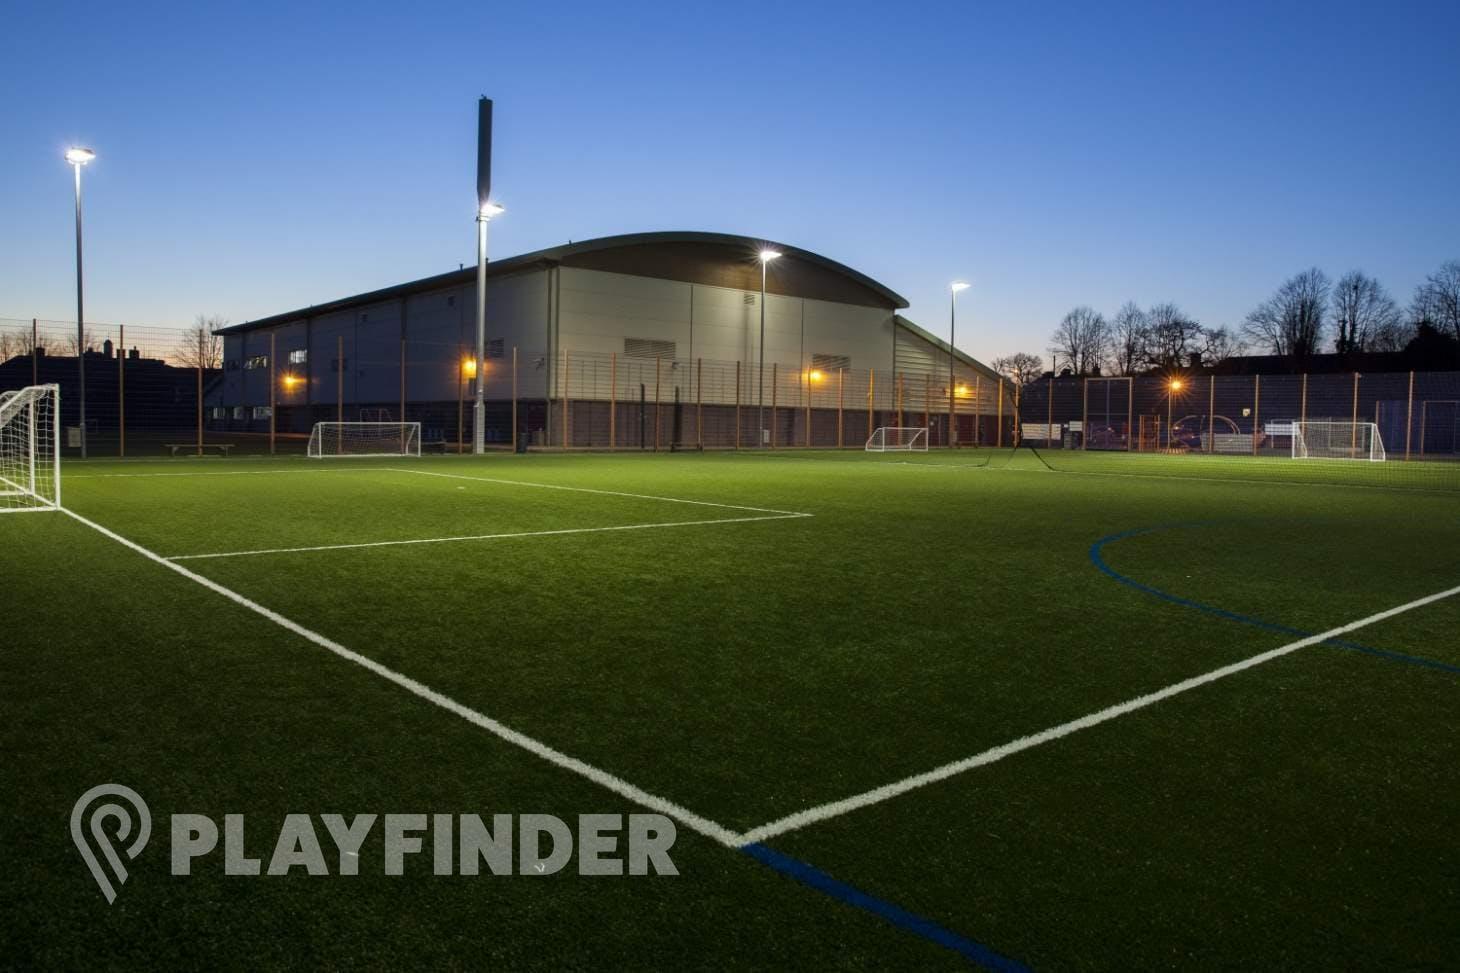 Burnt Oak Leisure Centre 7 a side | 3G Astroturf football pitch